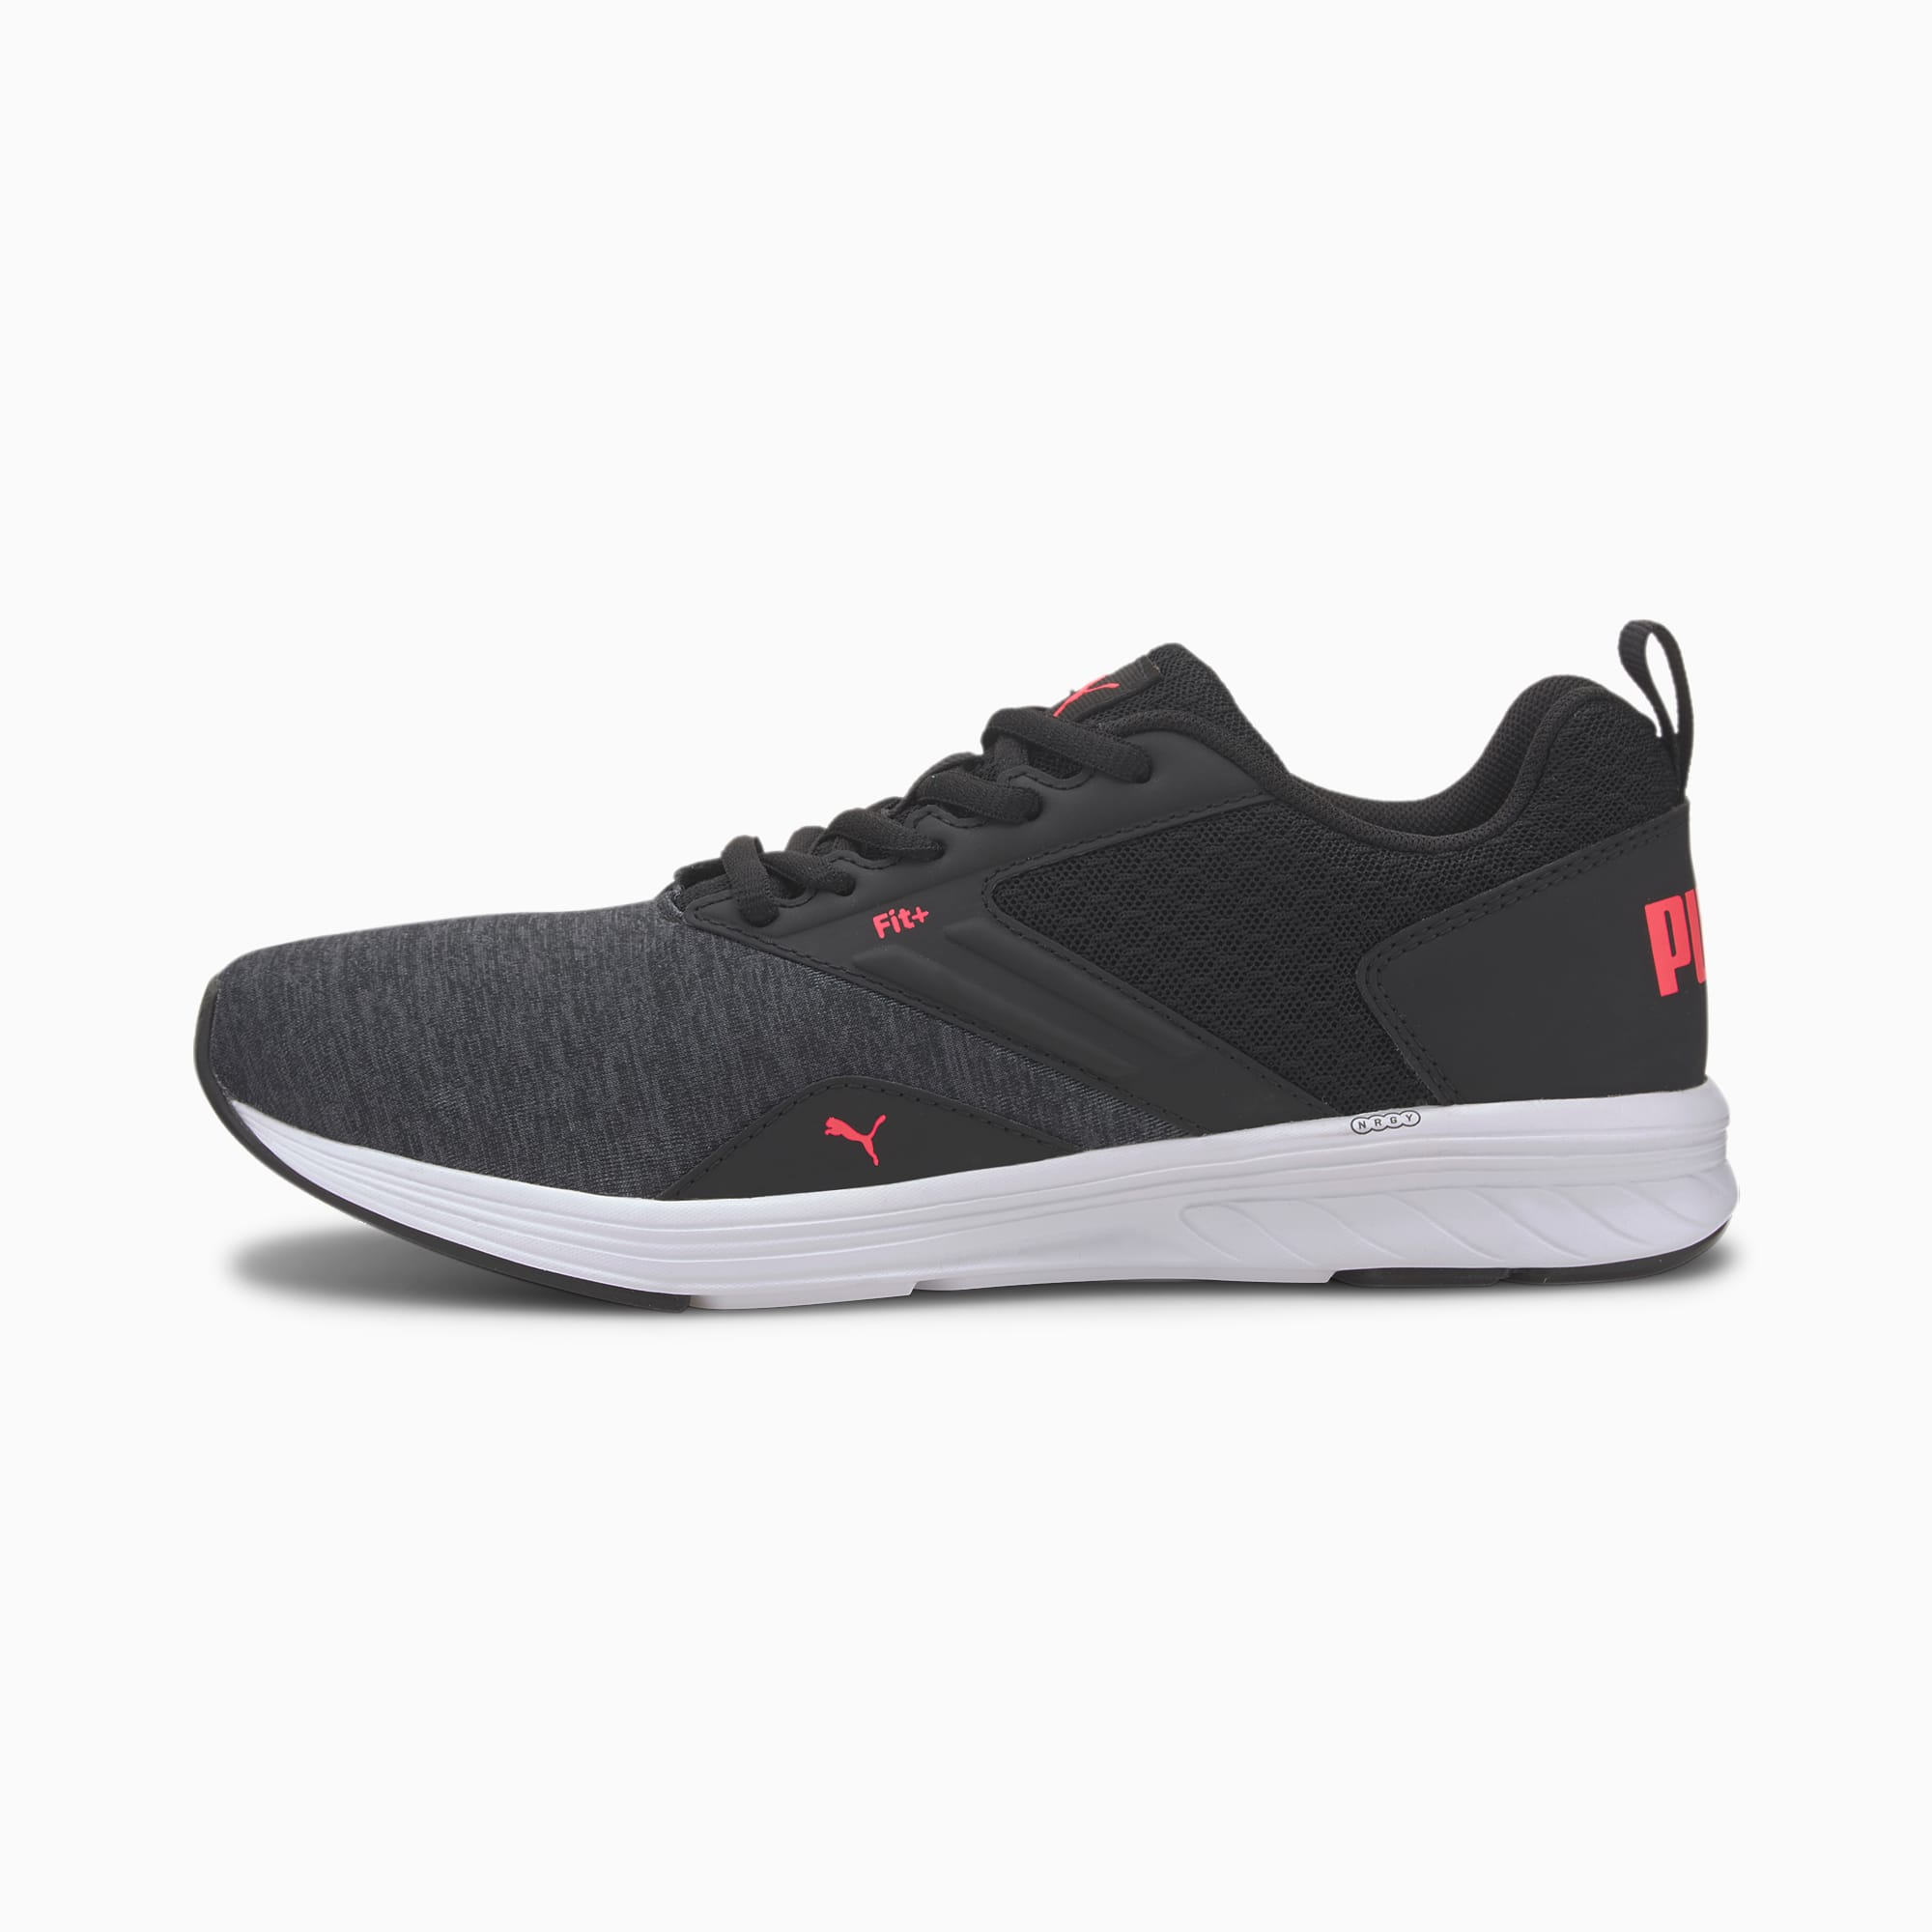 NRGY Comet Men's Running Shoes | PUMA US